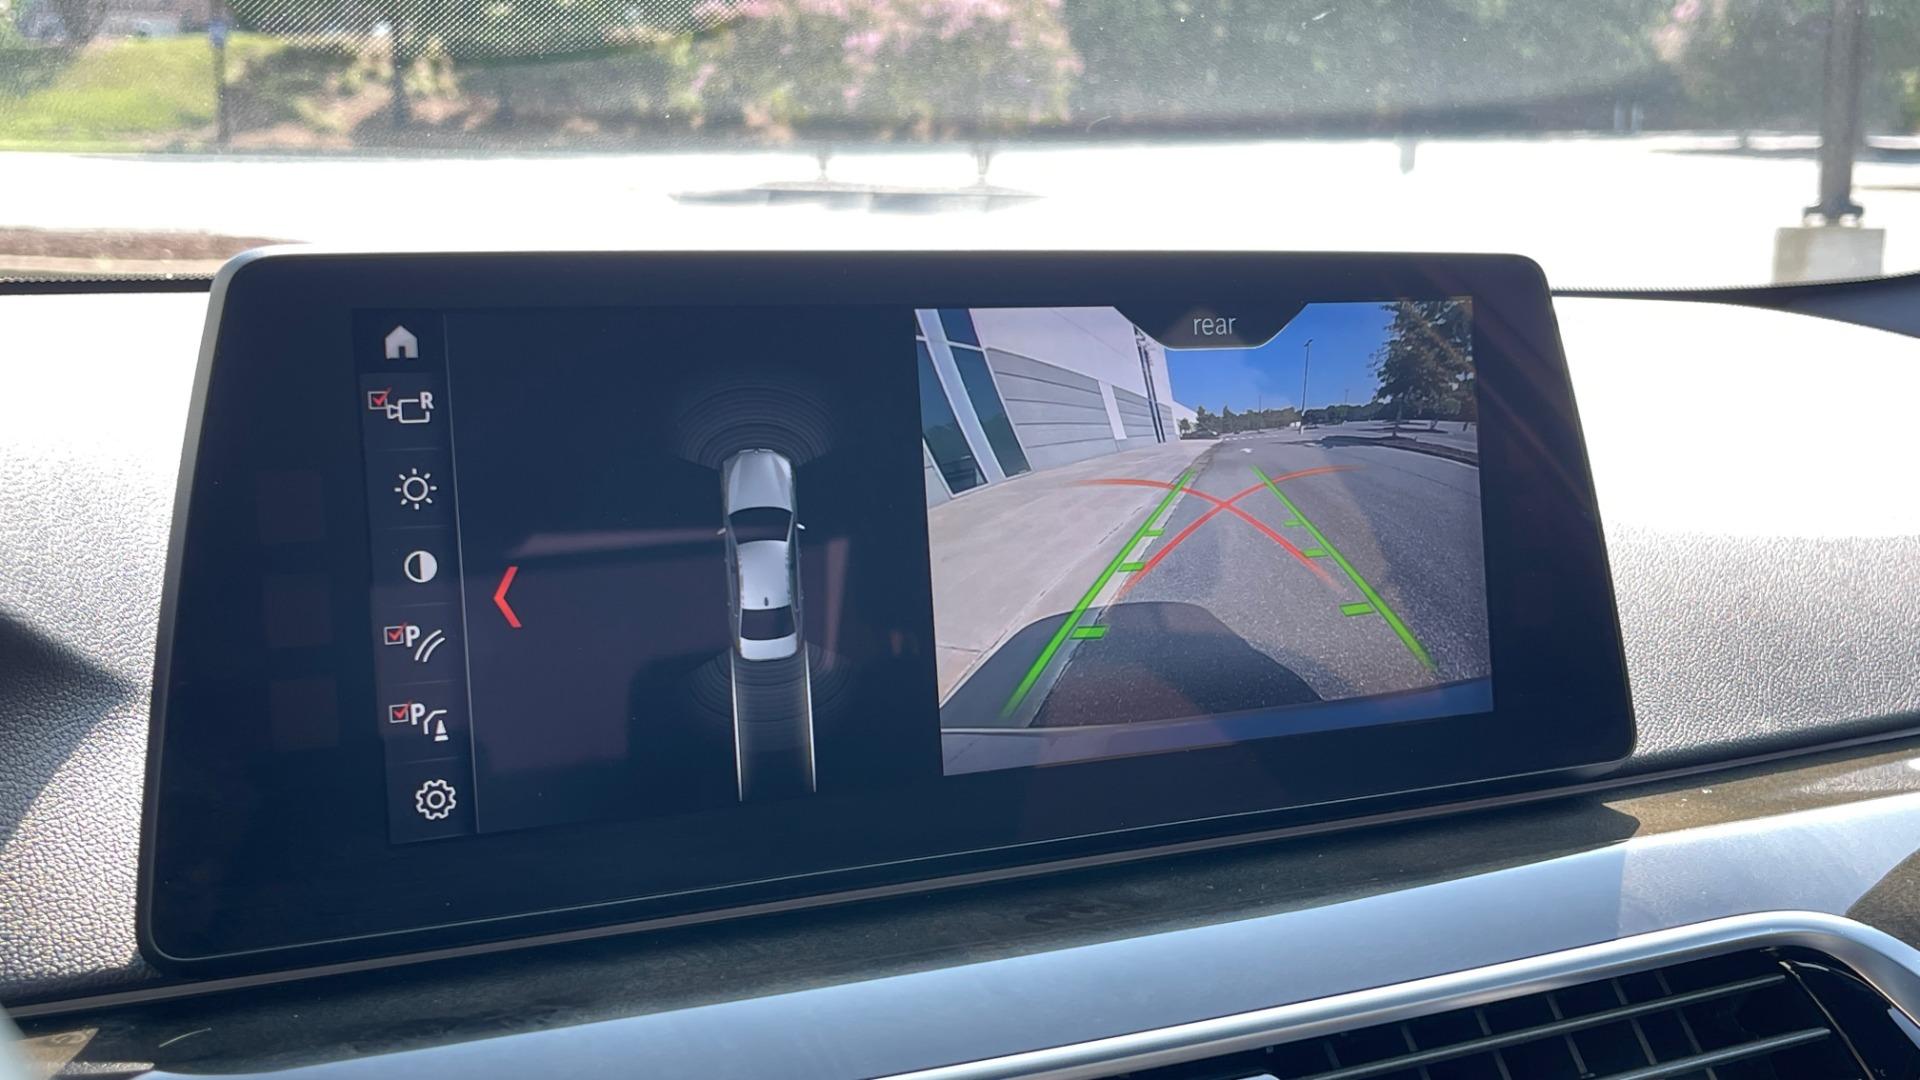 Used 2018 BMW 5 SERIES 540I XDRIVE M-SPORT / DRVR ASST / PDC / APPLE / HUD / H/K SND for sale $42,795 at Formula Imports in Charlotte NC 28227 43